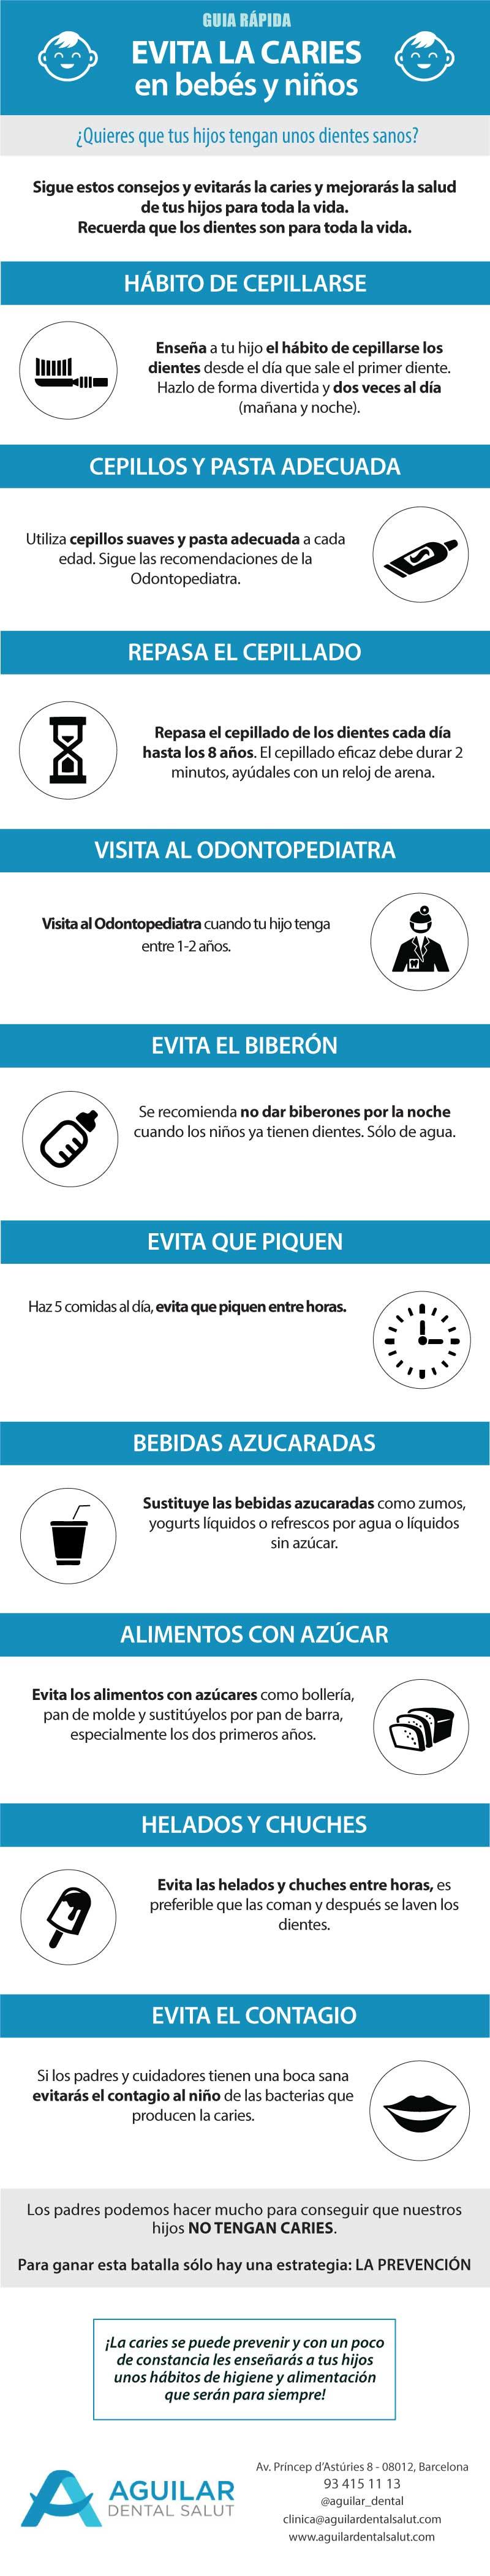 infografia-web-caries-niños